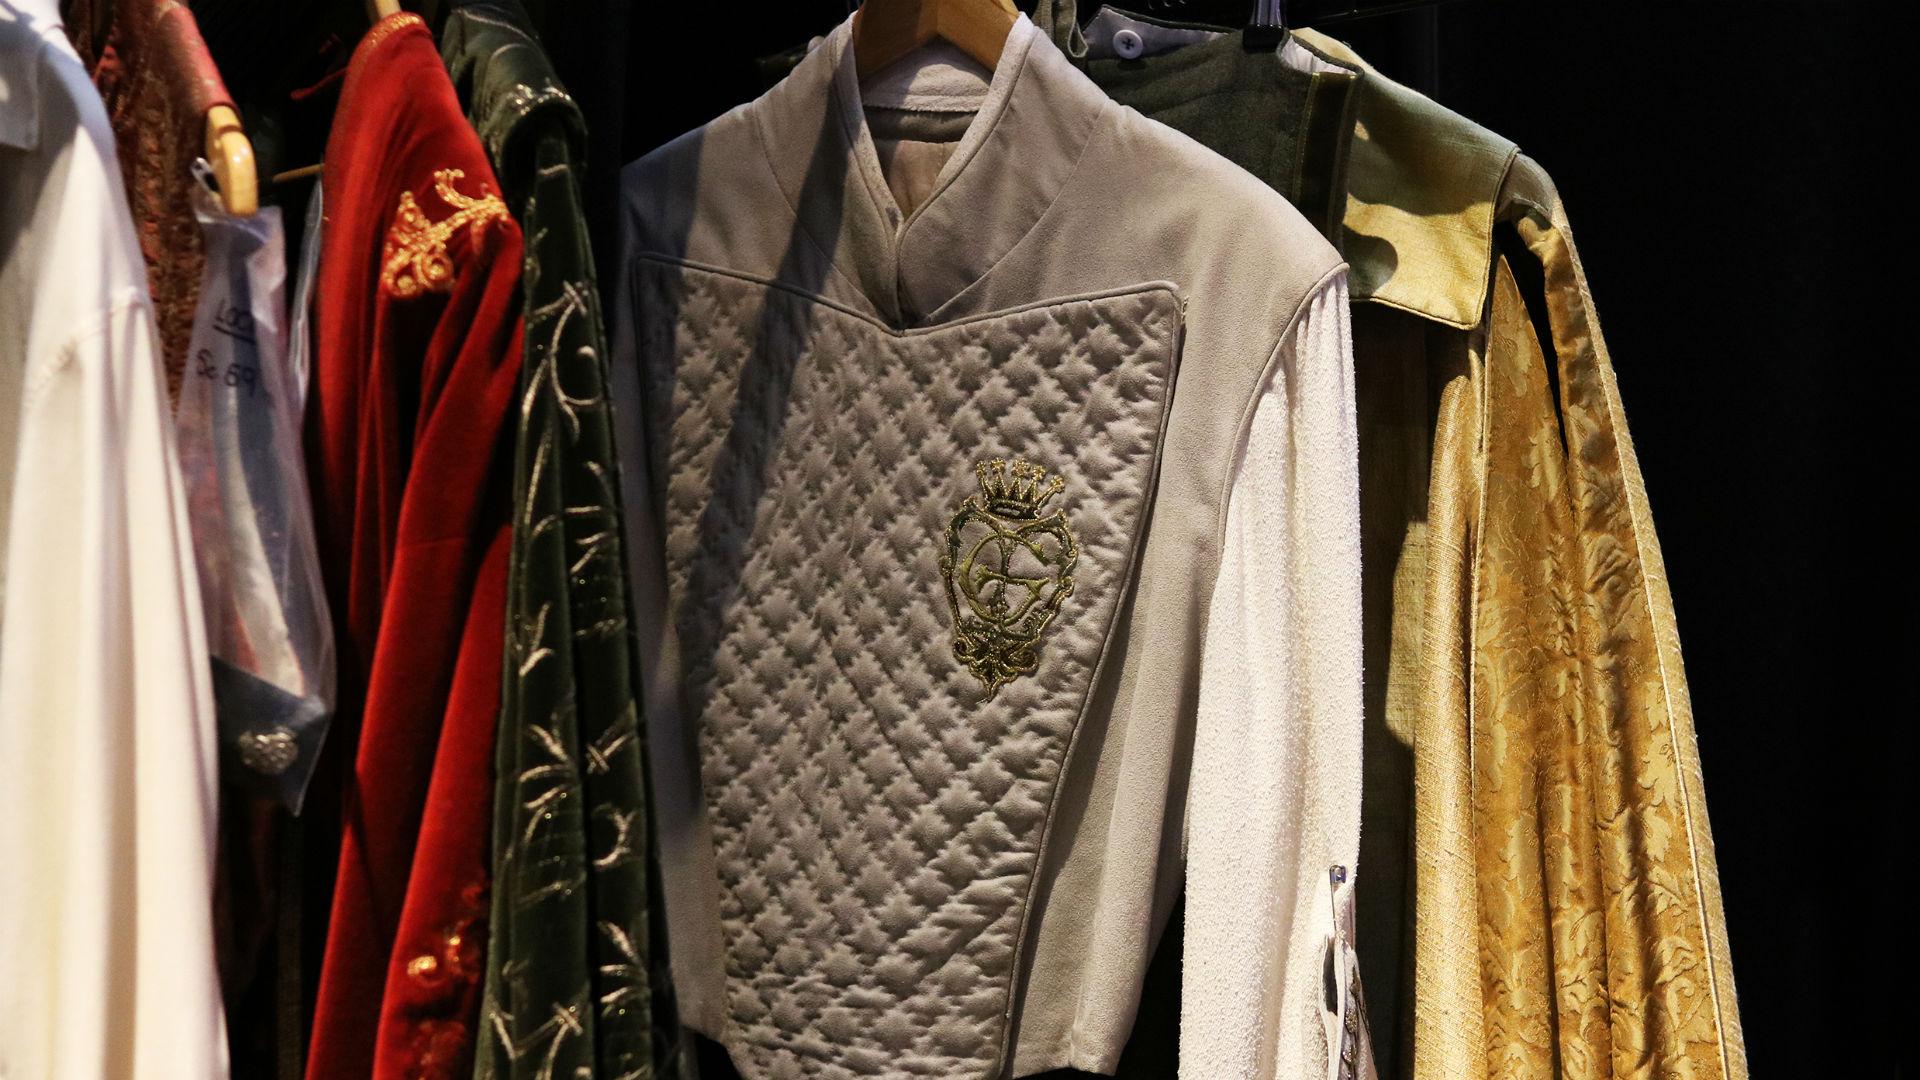 Lockhart costume rail in Behind the Seams at Warner Bros. Studio Tour London